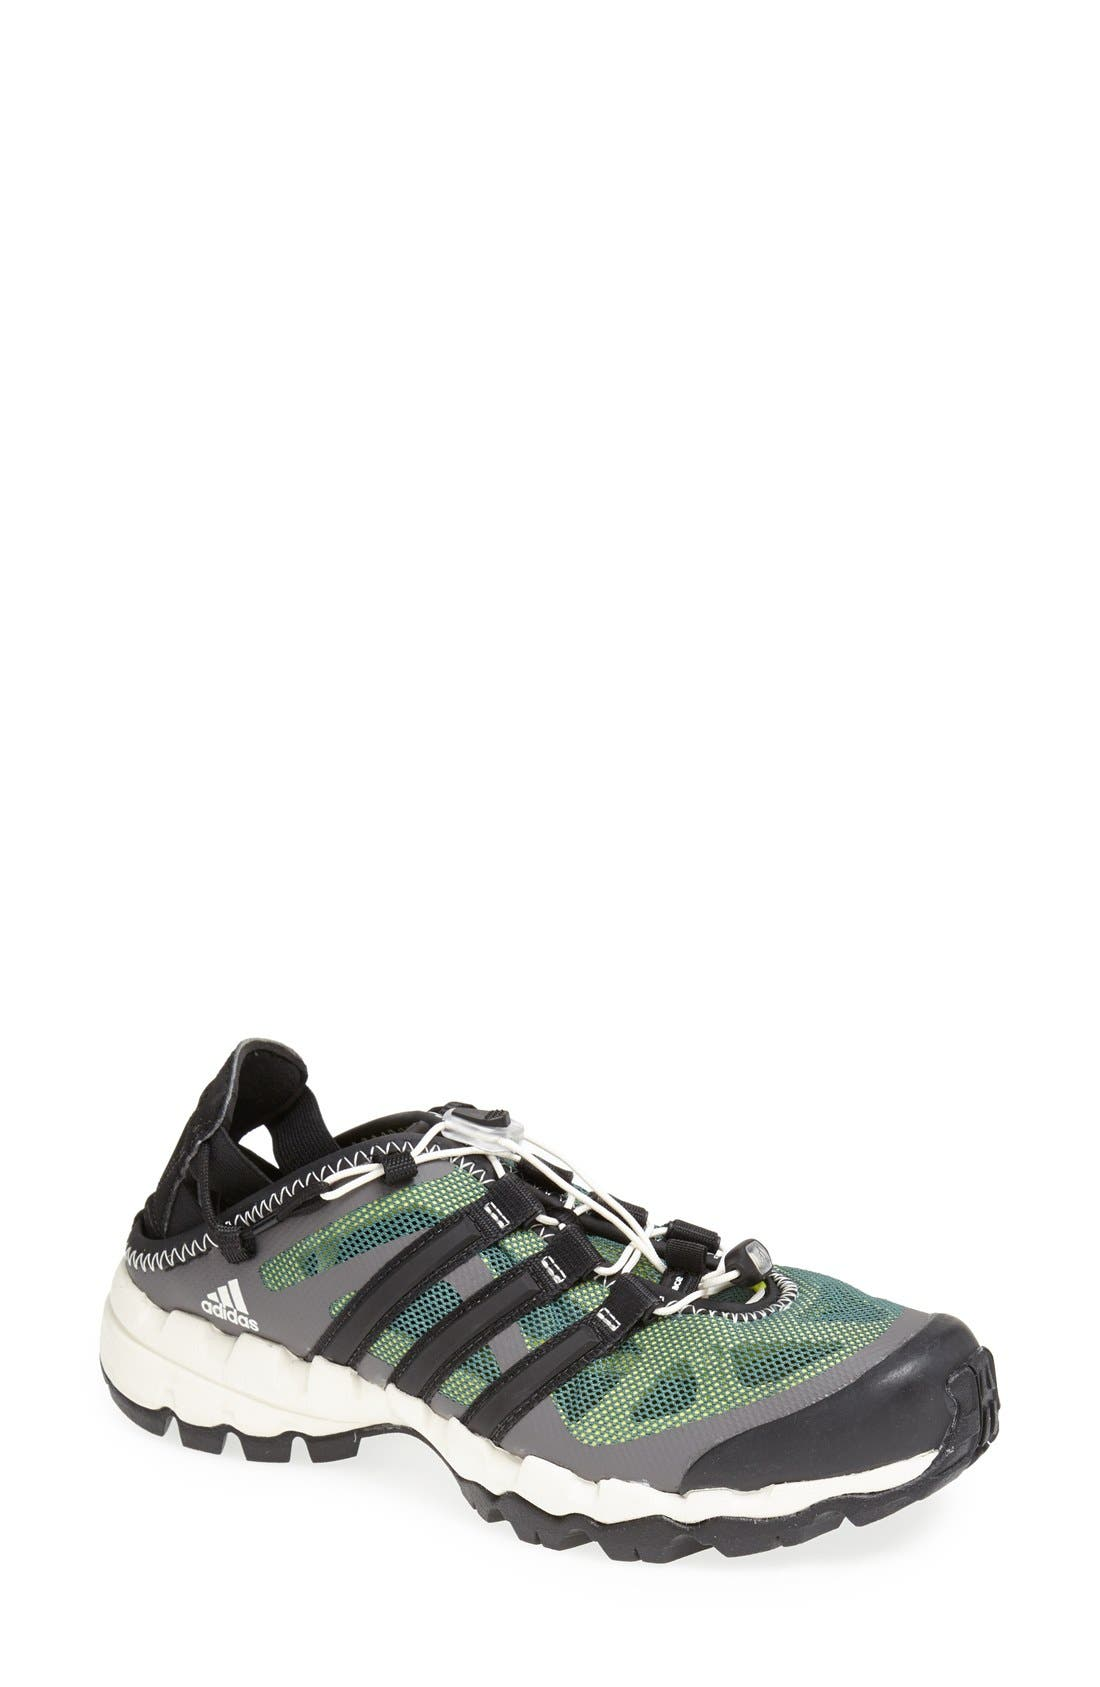 Main Image - adidas 'Hydroterra' Walking Shoe (Women)